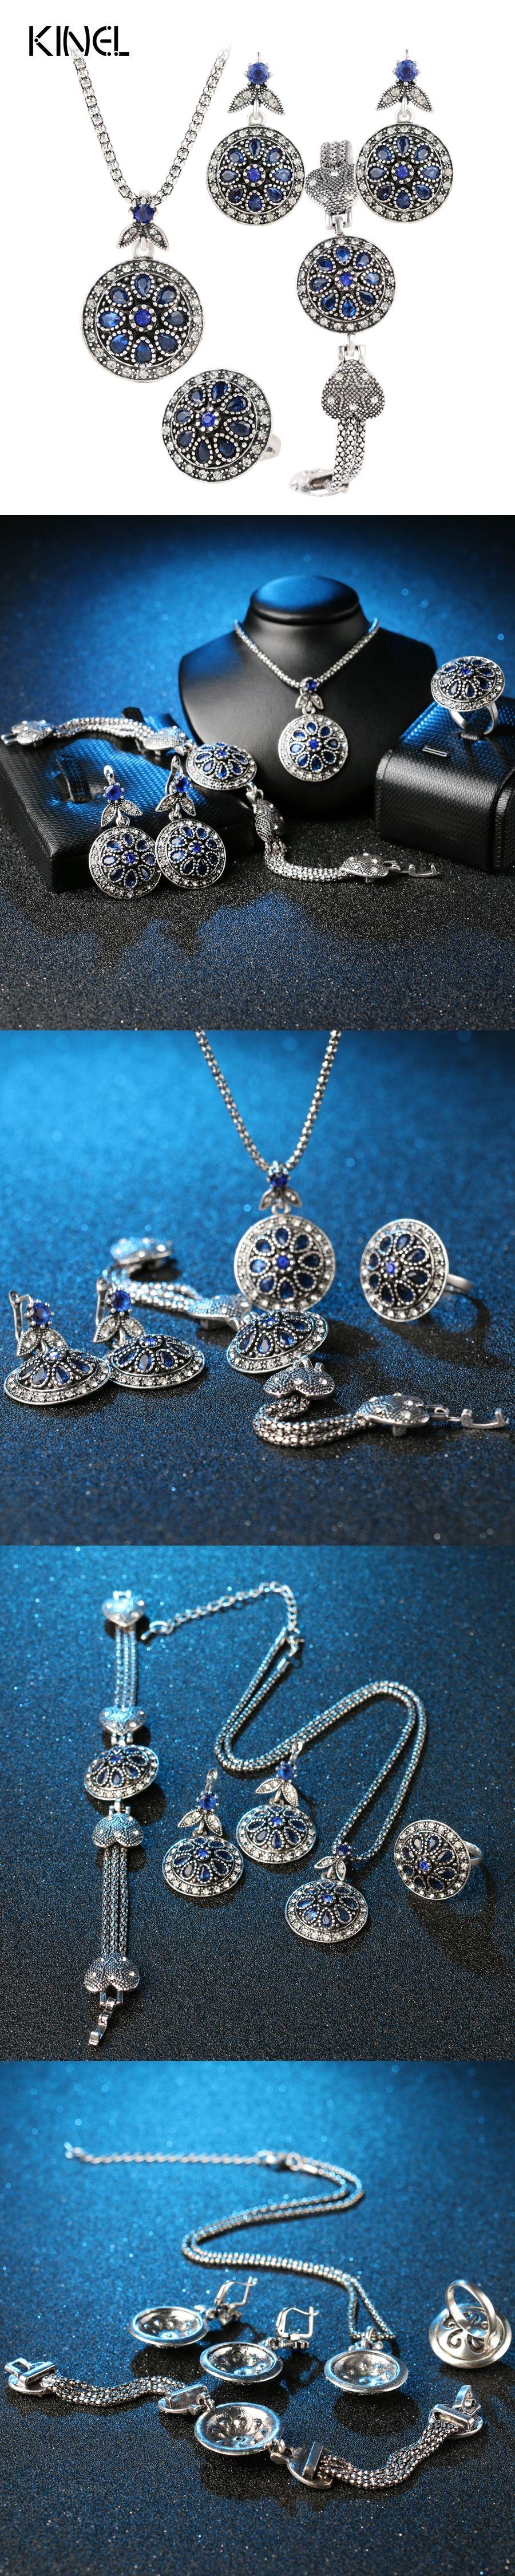 Charm vintage jewelry set round crystal flower earrings bracelets